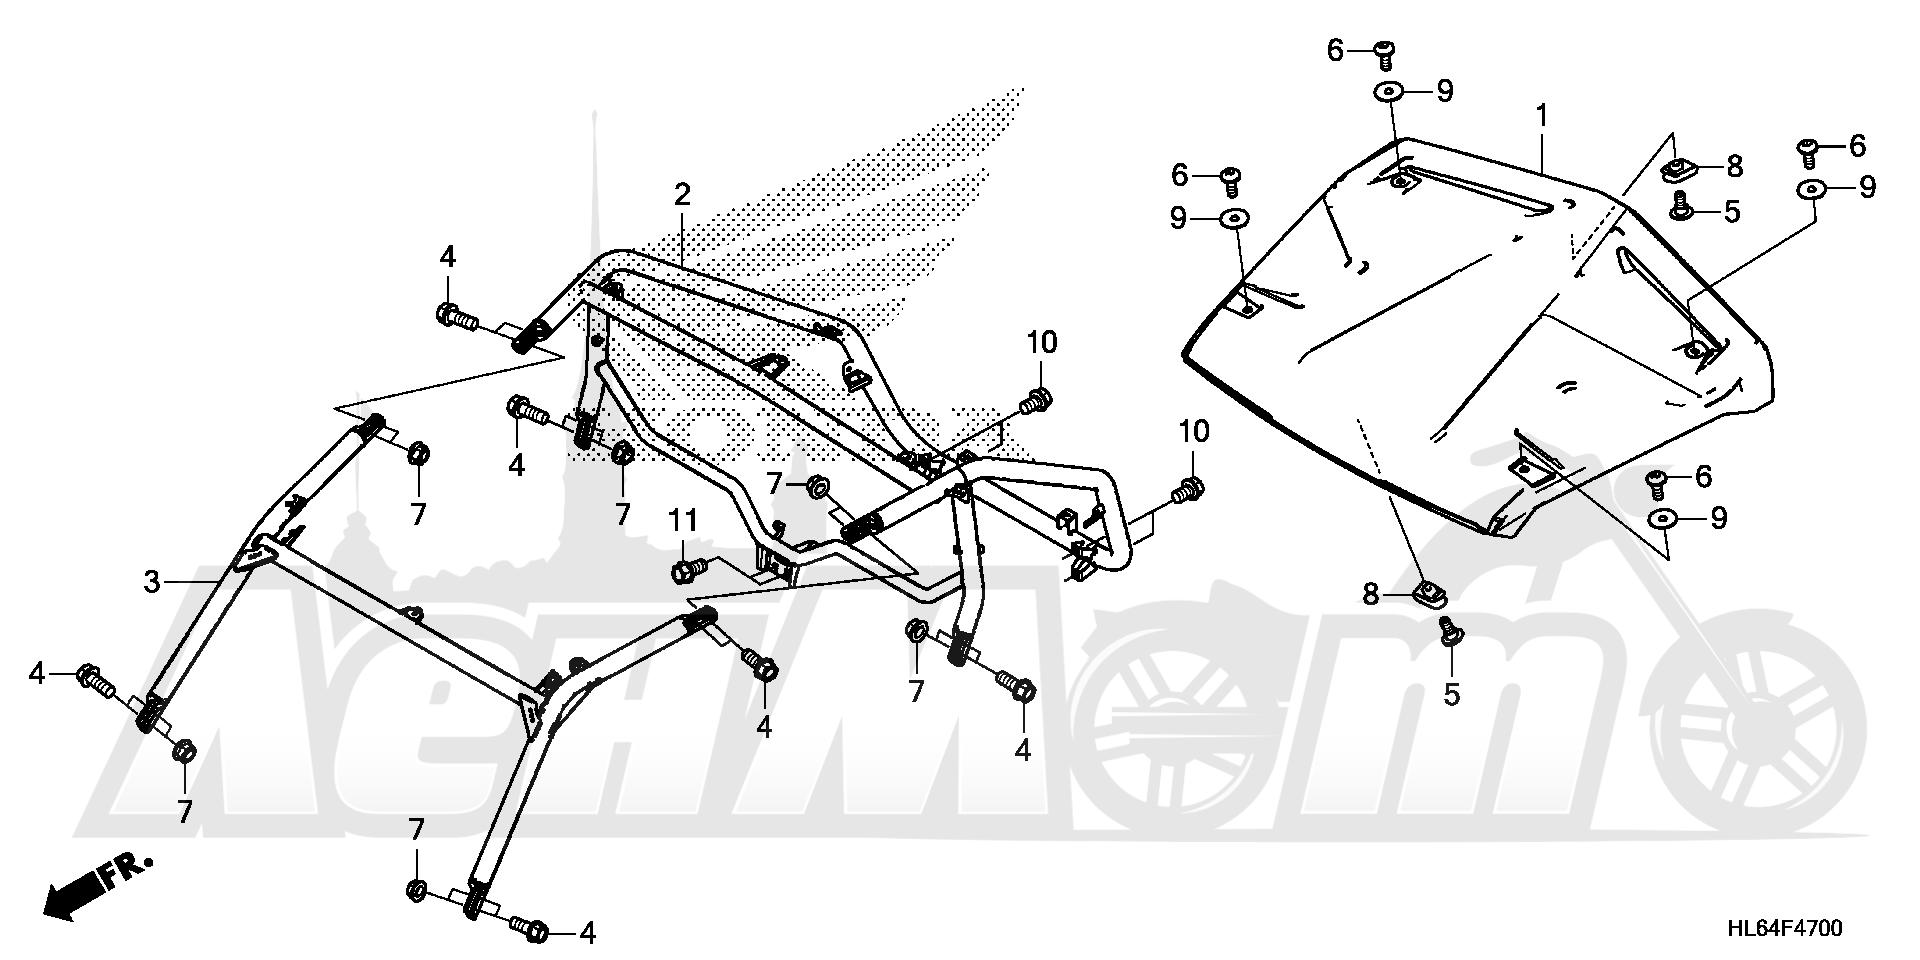 Запчасти для Квадроцикла Honda 2019 SXS1000S2R Раздел: ROLL BAR AND ROOF   рулон планка и крыша